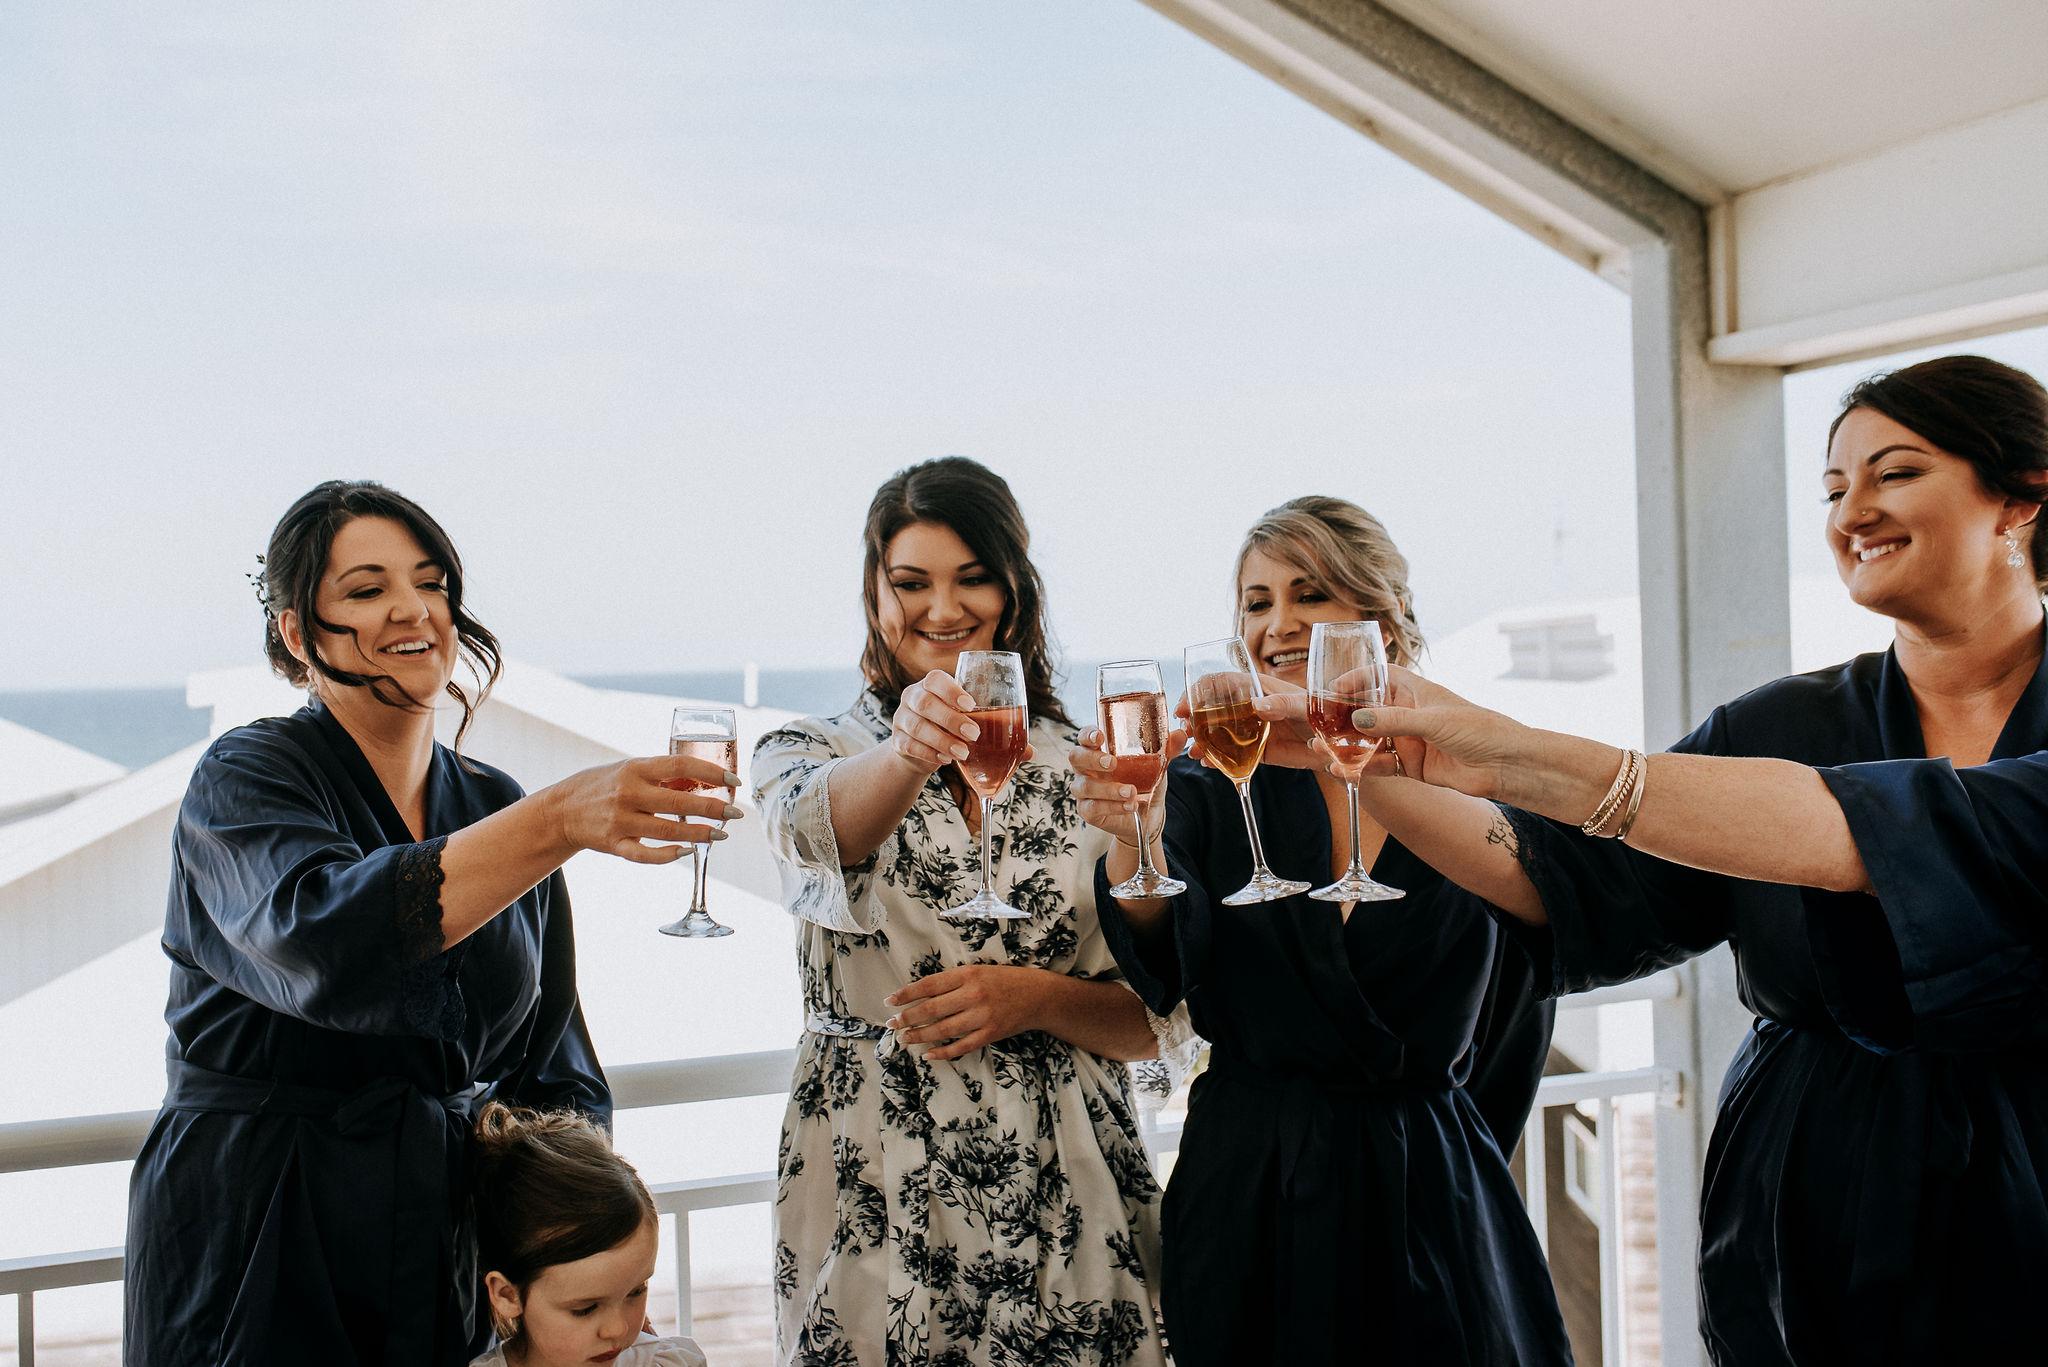 CAVES-BEACH-HOTEL-WEDDING-PATTEN-217.jpg